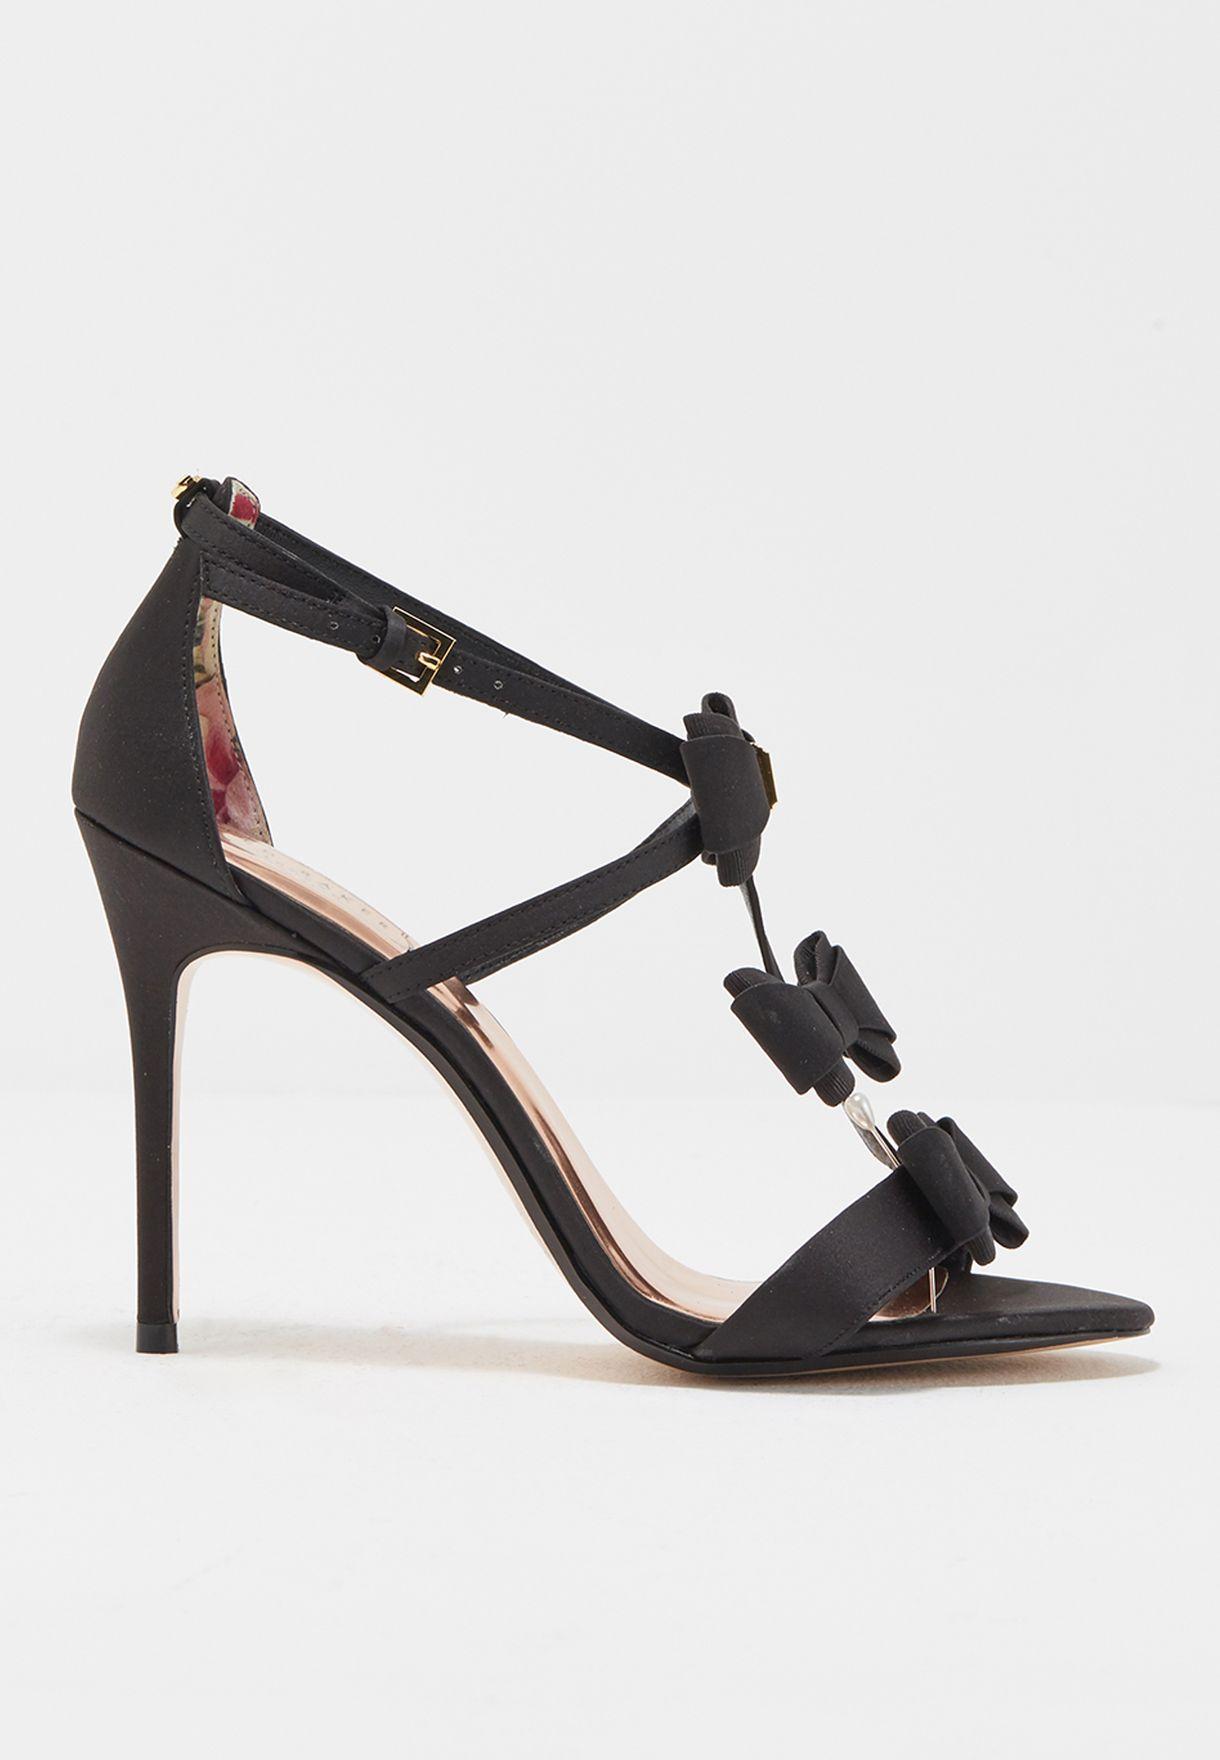 0862e33347223 Shop Ted baker black Ankle Strap Sandal APPOLINI for Women in Kuwait -  TE456SH95QCU